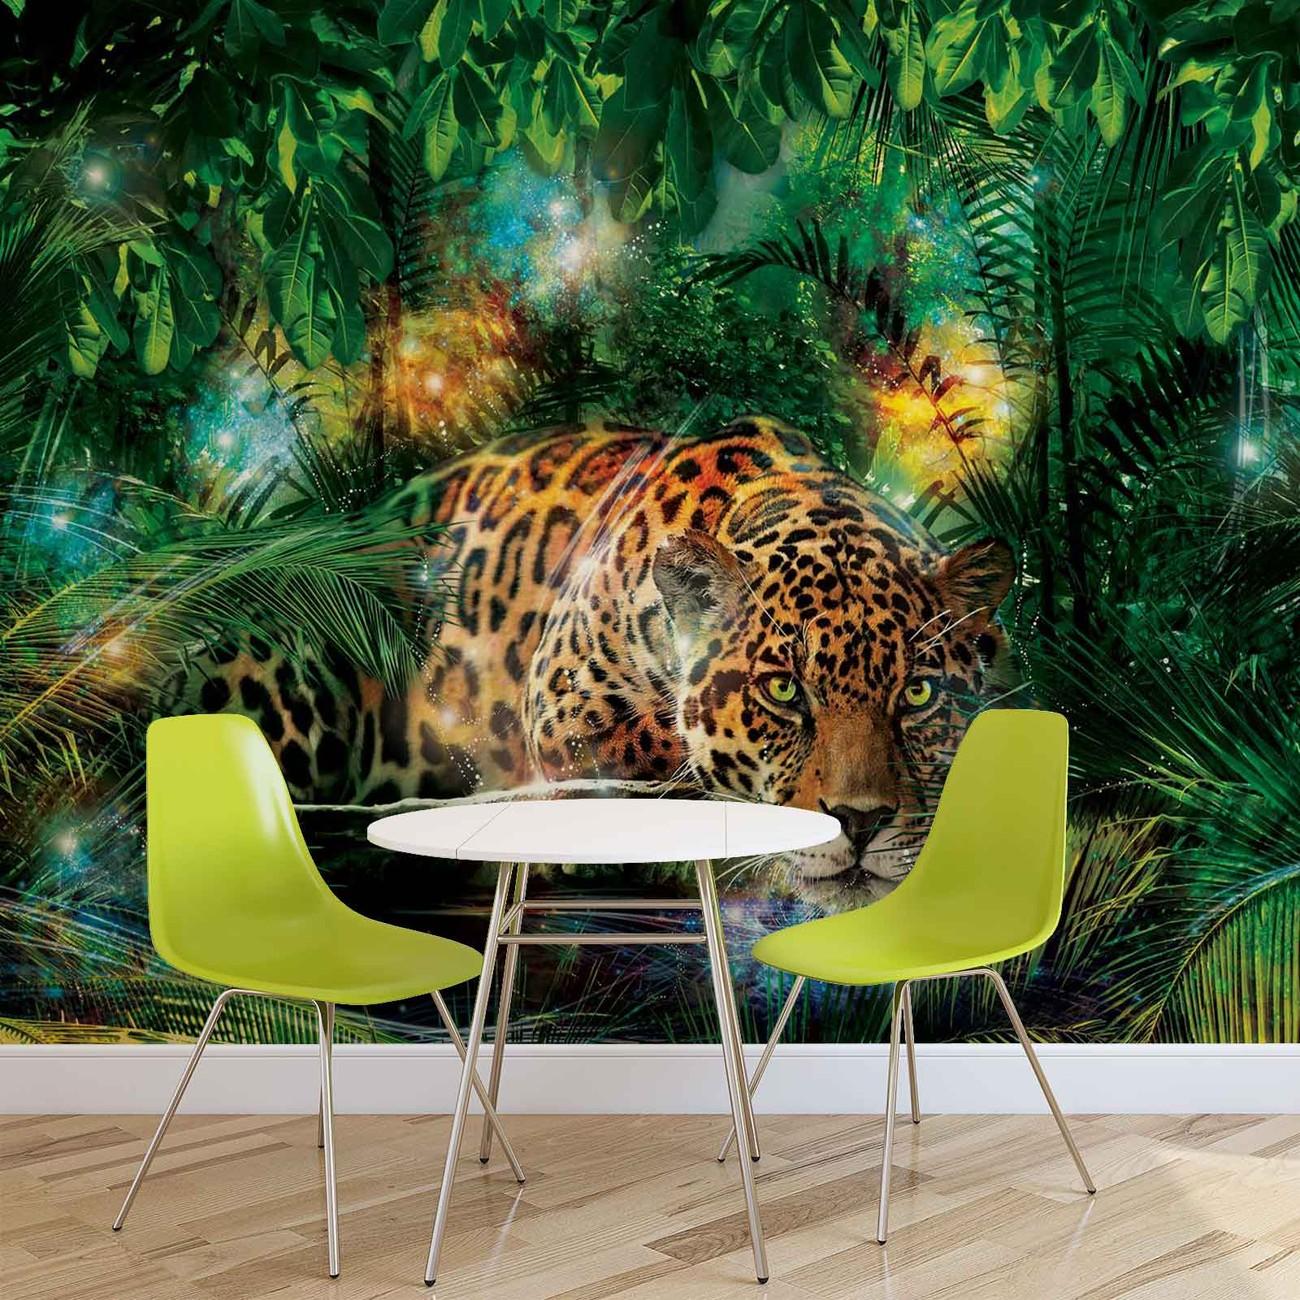 fototapete tapete leopard dschungel bei europosters kostenloser versand. Black Bedroom Furniture Sets. Home Design Ideas